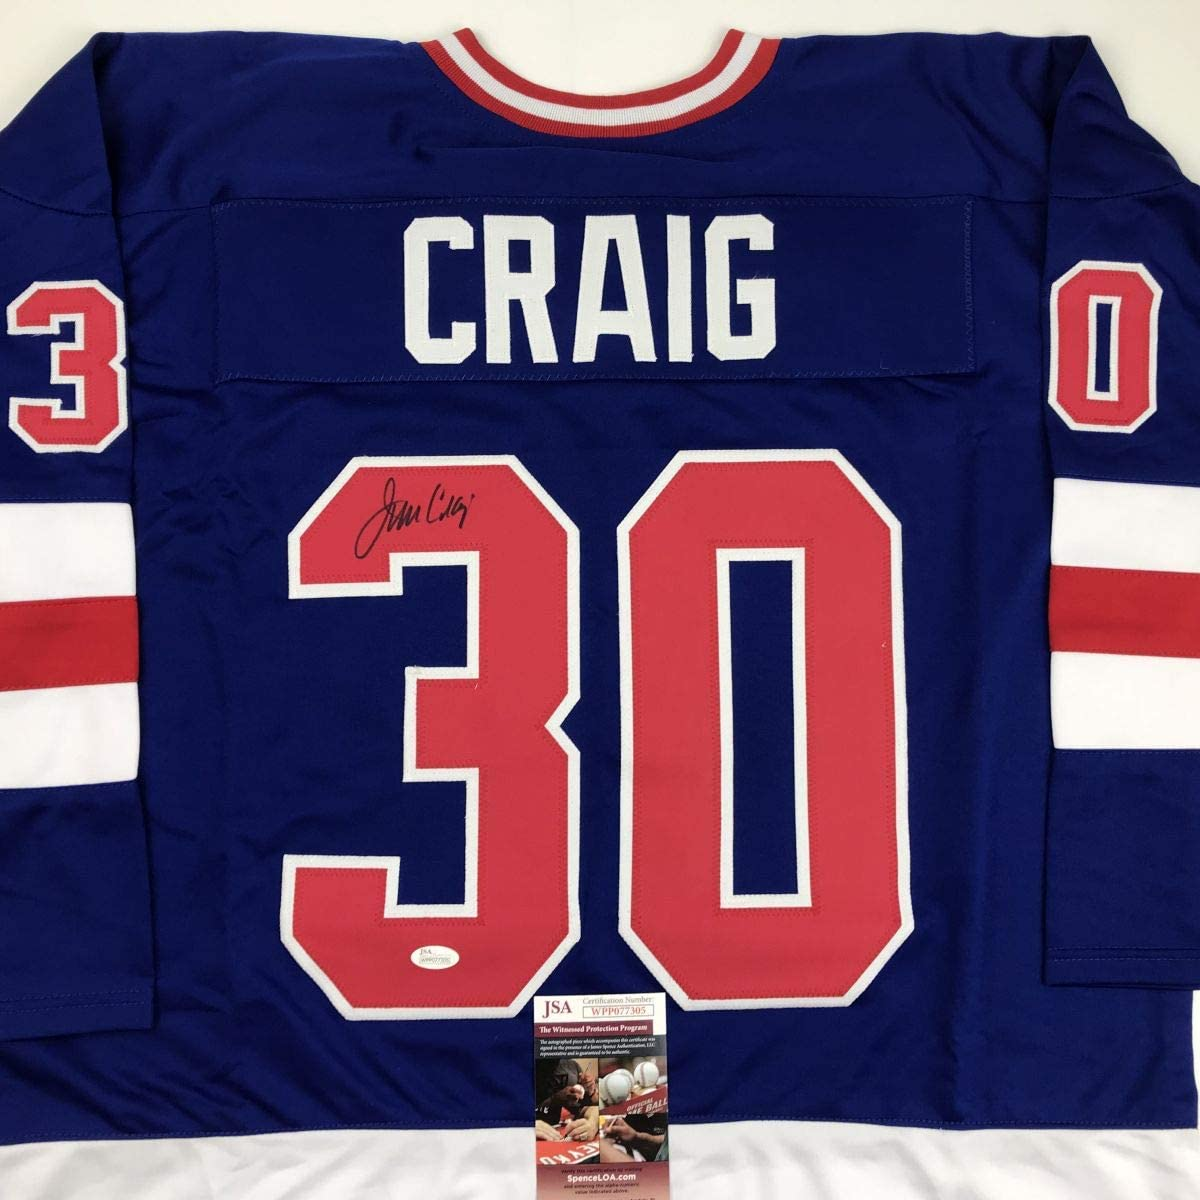 Autographed/Signed Jim Craig Blue Team USA Miracle On Ice 1980 Olympics Hockey Jersey JSA COA